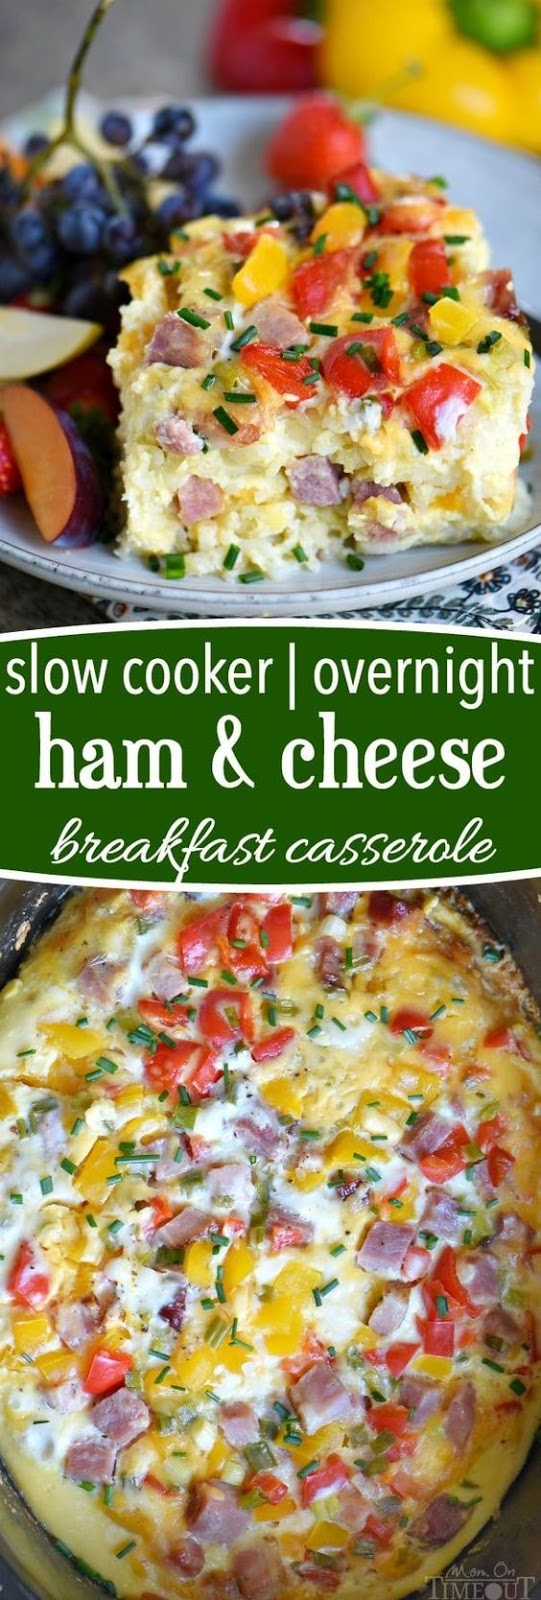 Slow Cooker Overnight Ham and Cheese Breakfast Casserole #BREAKFAST #SLOWCOOKER #AMERICAN